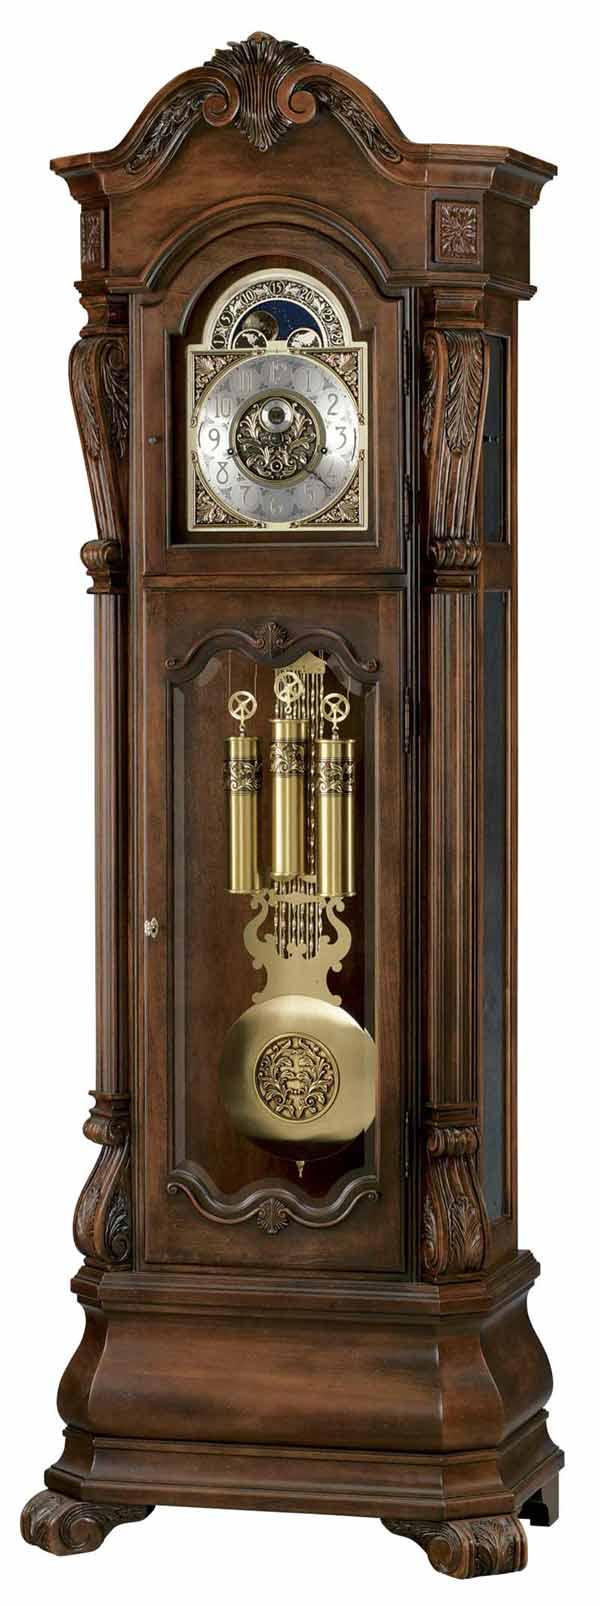 Howard Miller Hamlin 611 025 Grandfather Clock With In